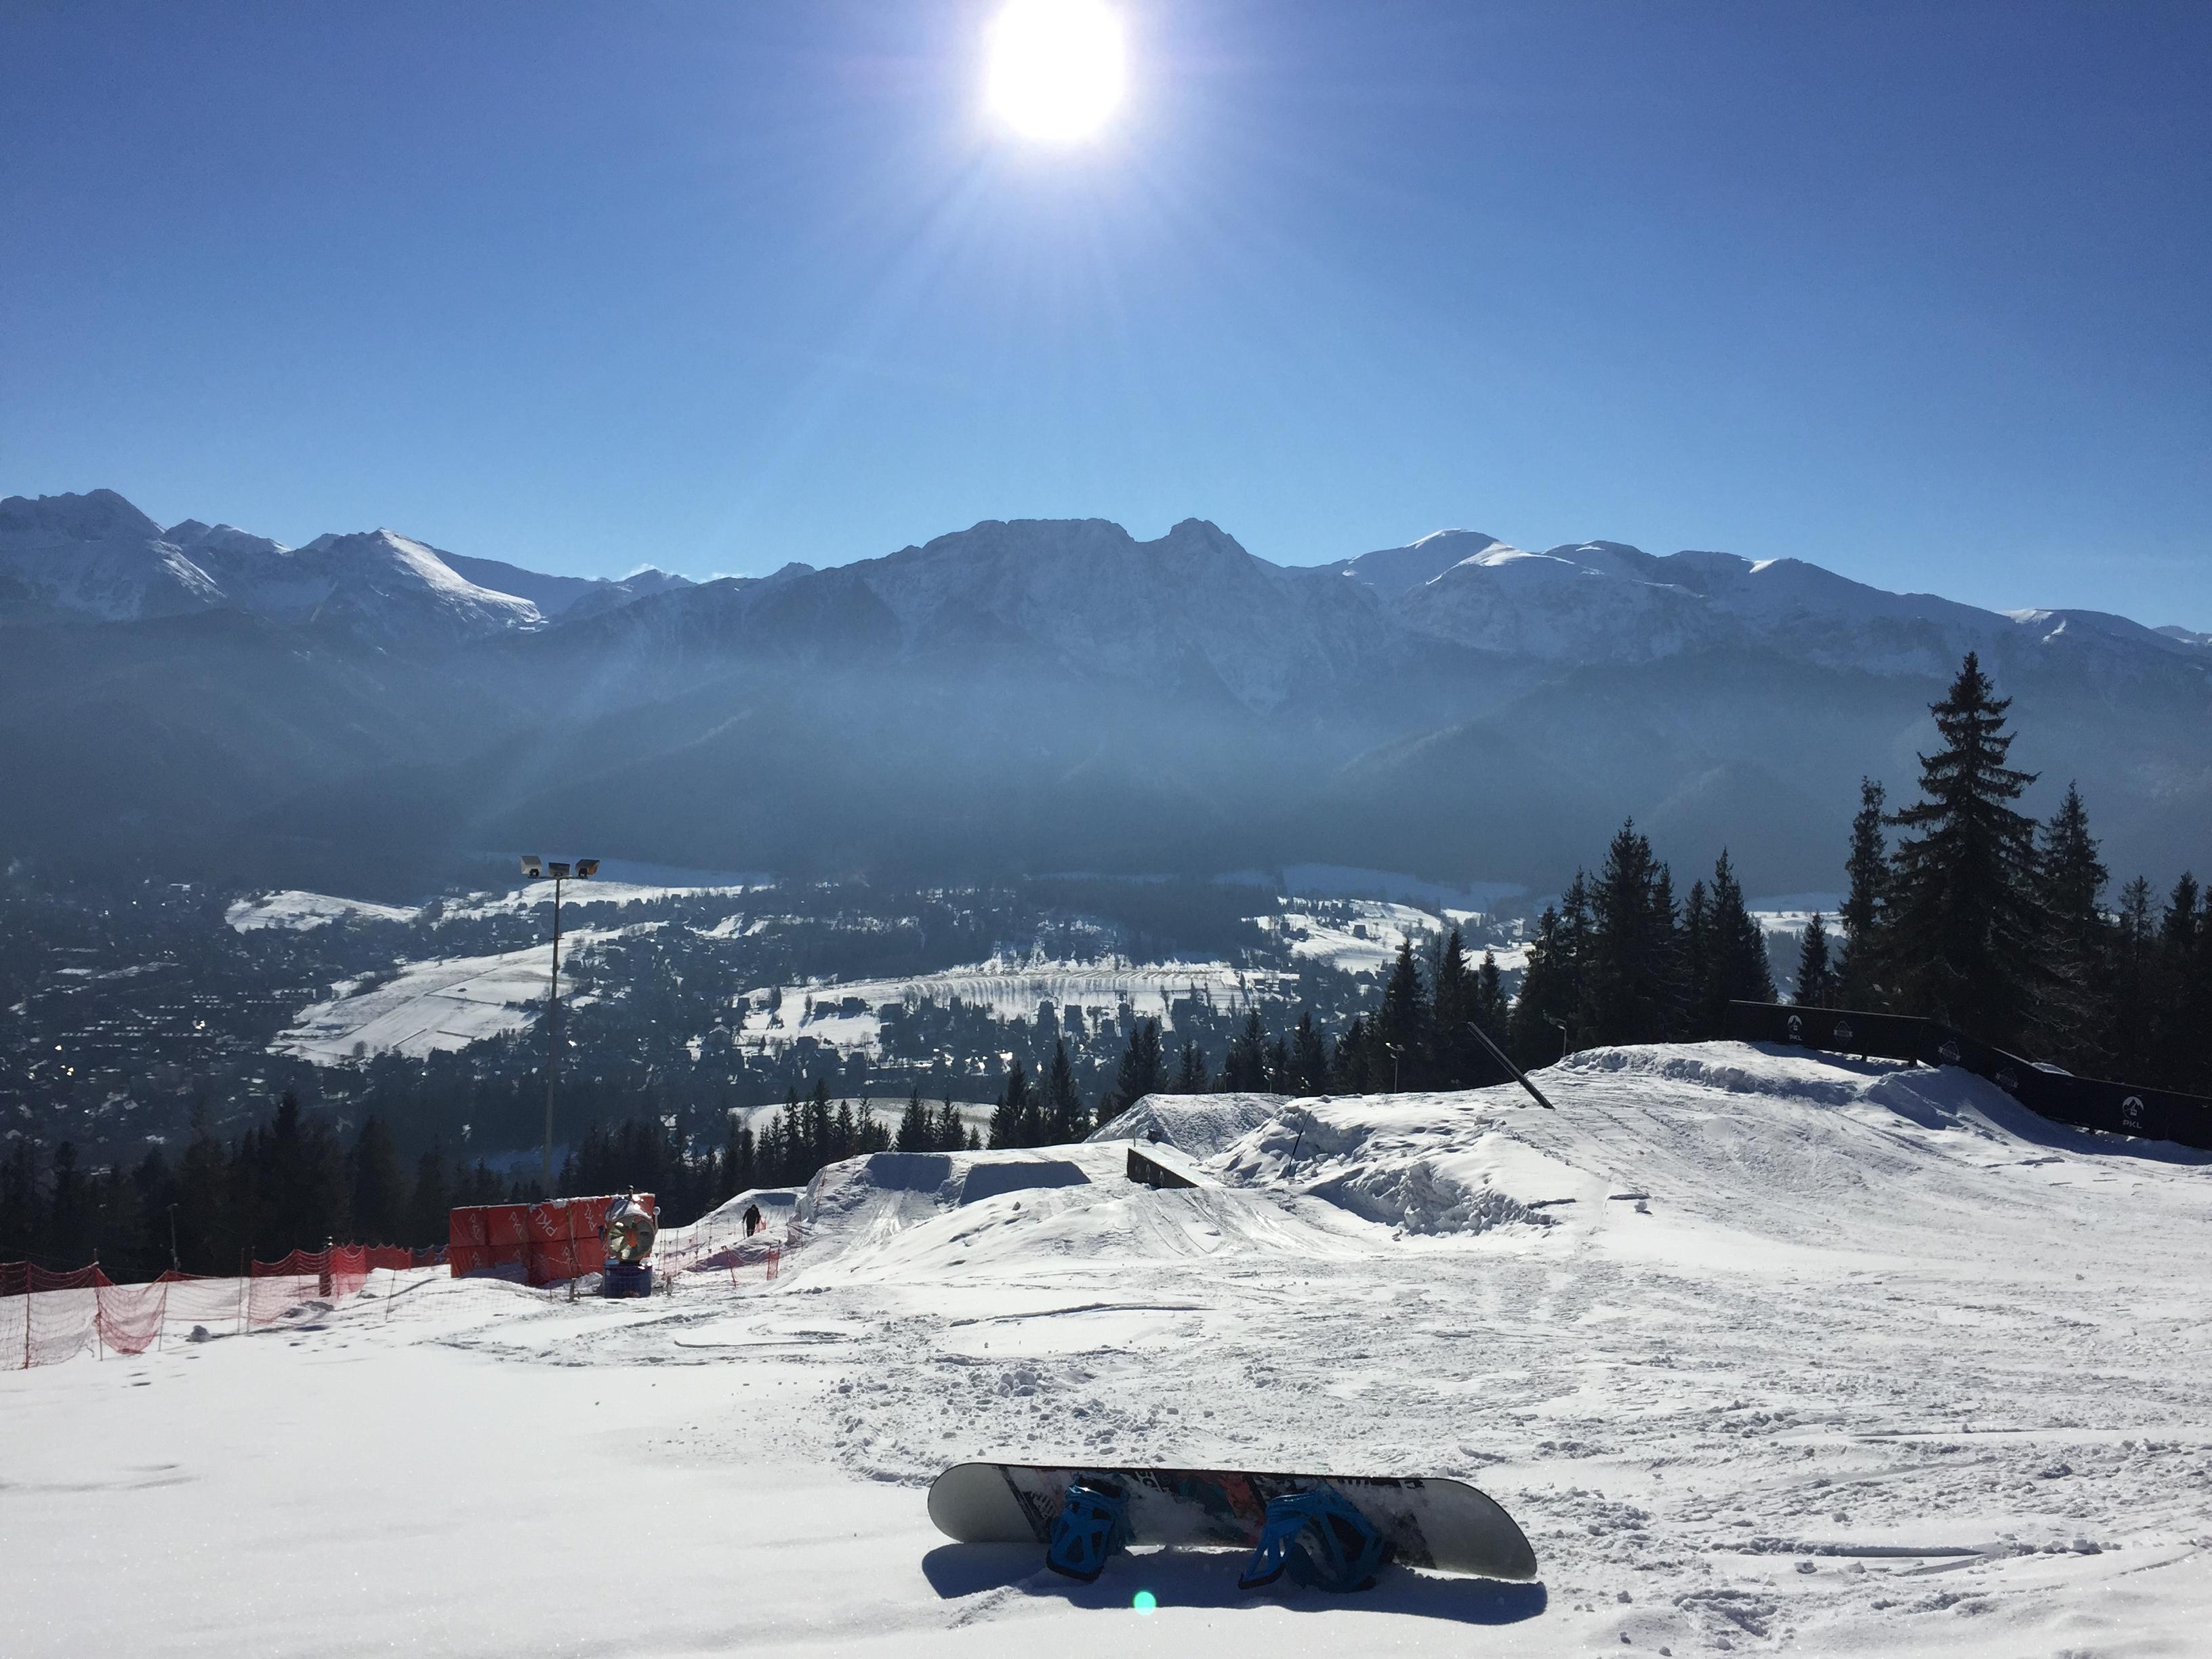 Goobaya Snowpark in Zakopane, Poland on top of Gubalowka